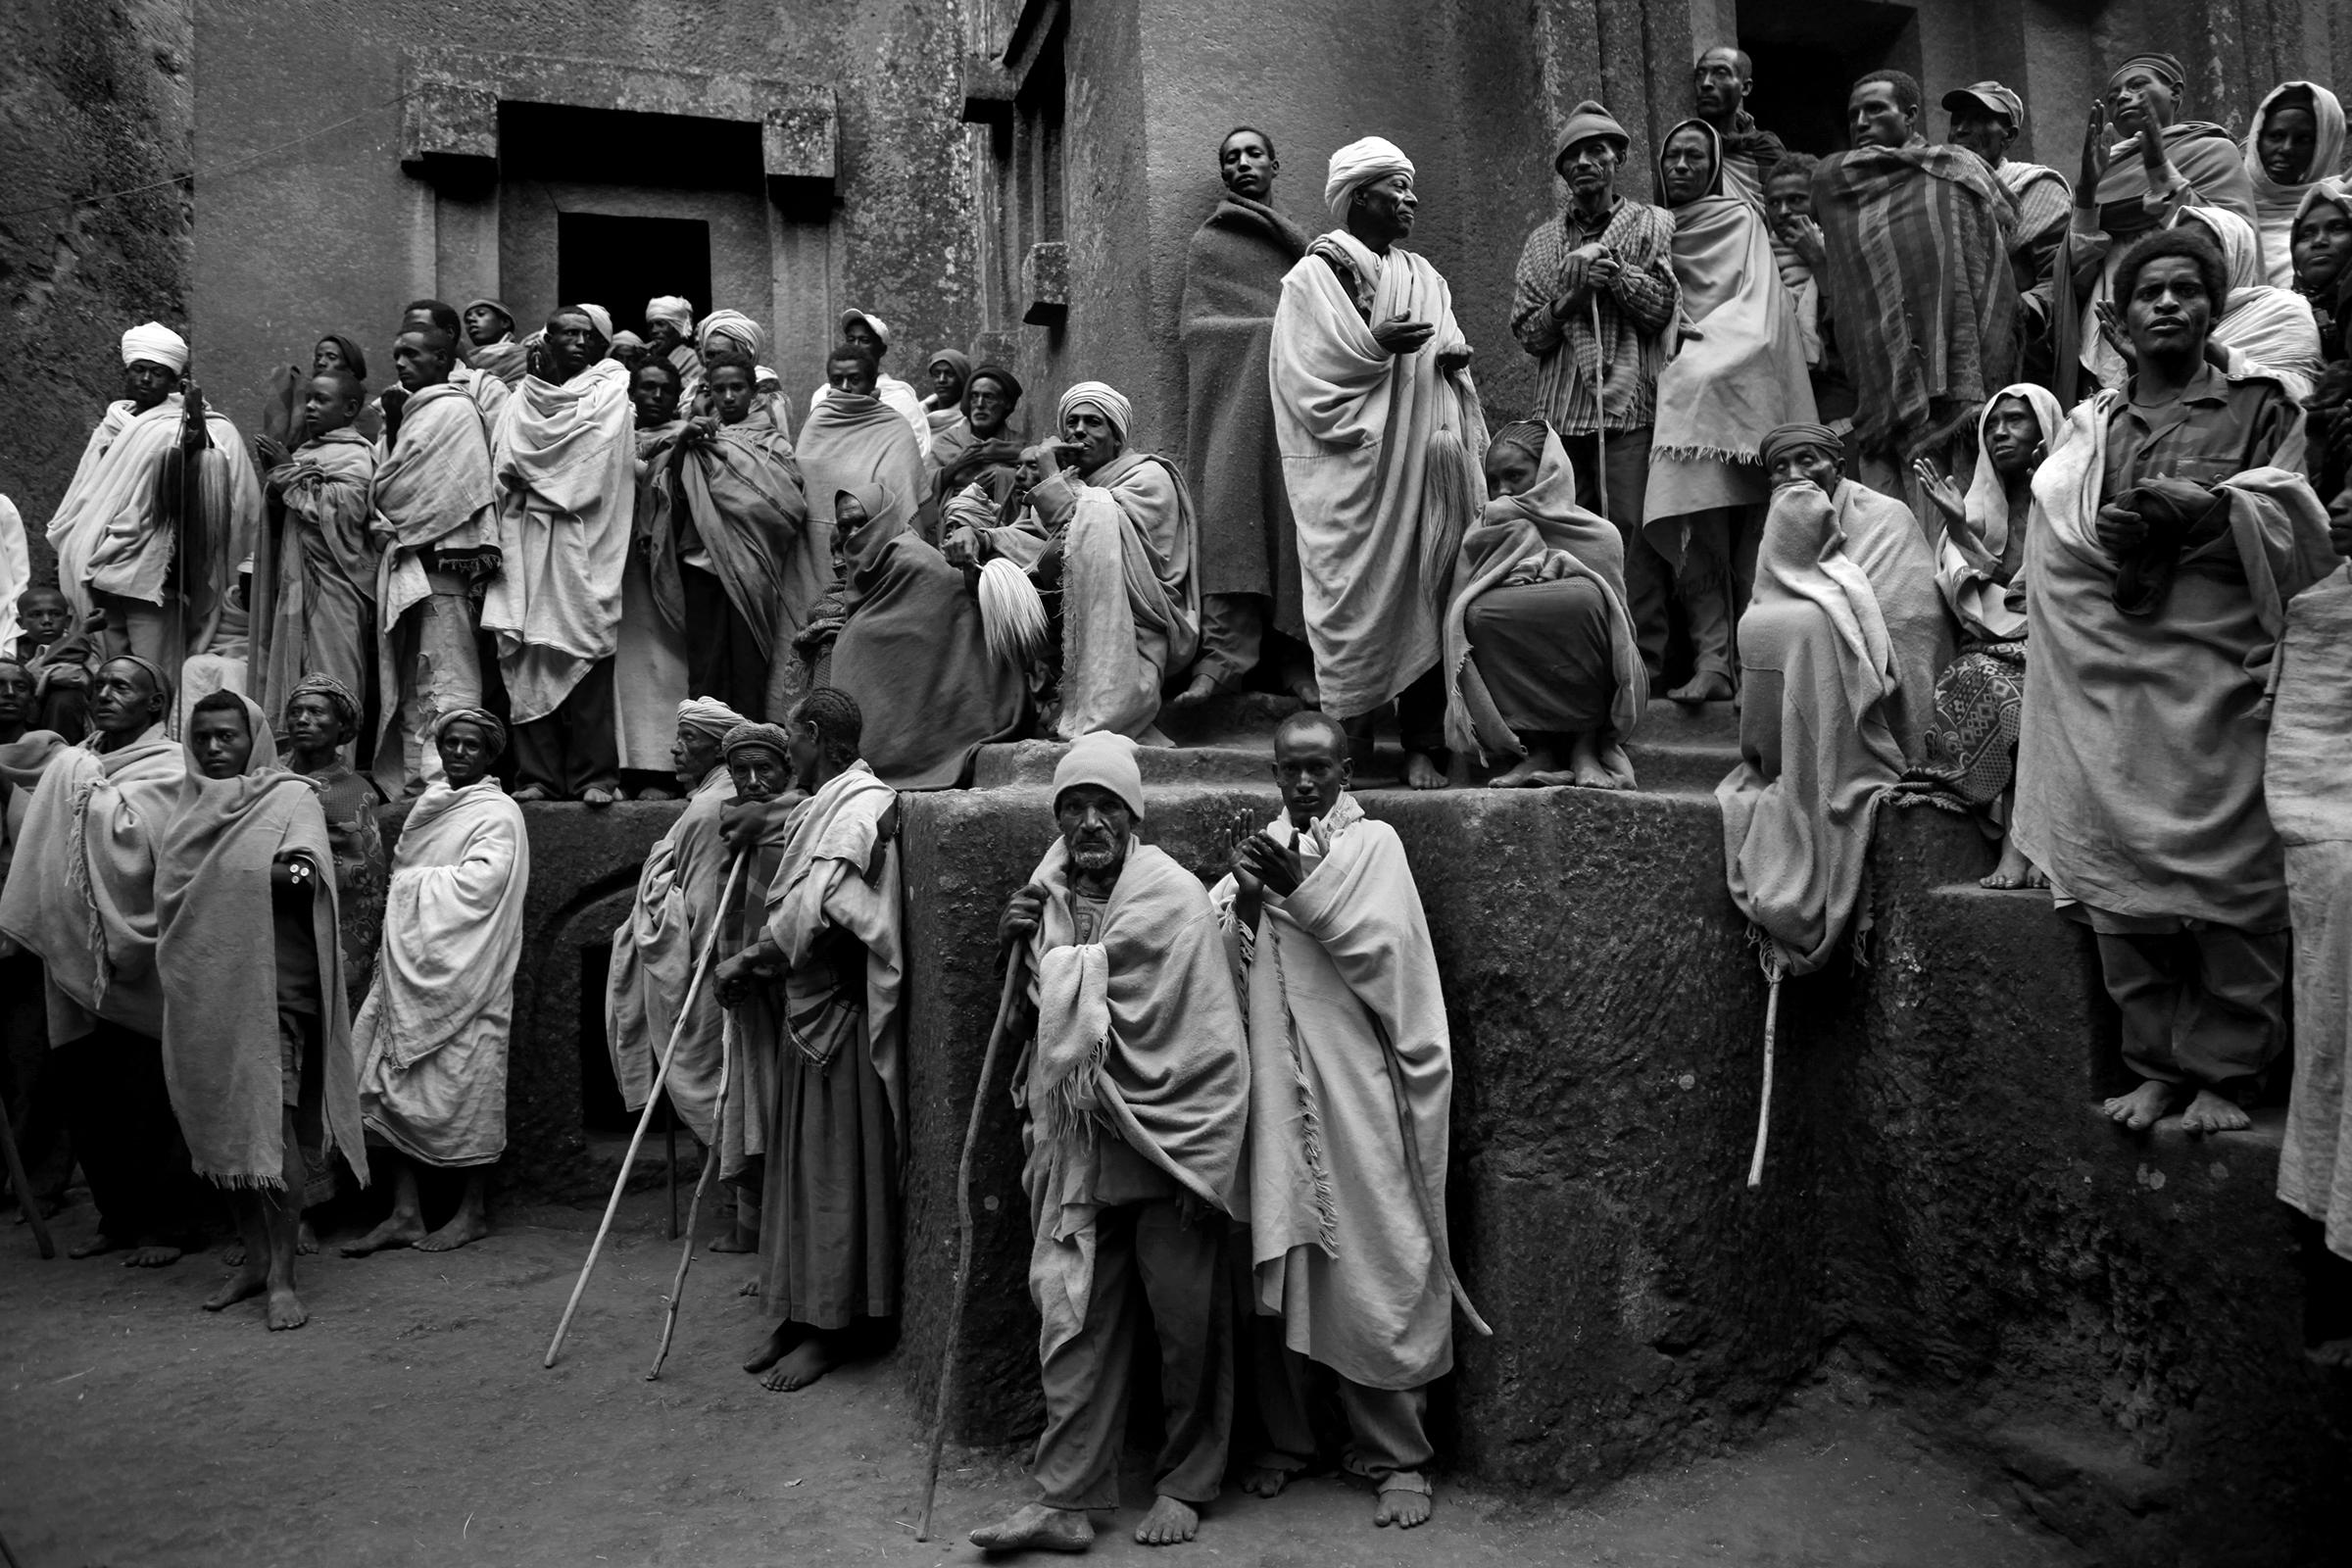 Gali_Tibbon_Jerusalem_of_Africa_004.JPG